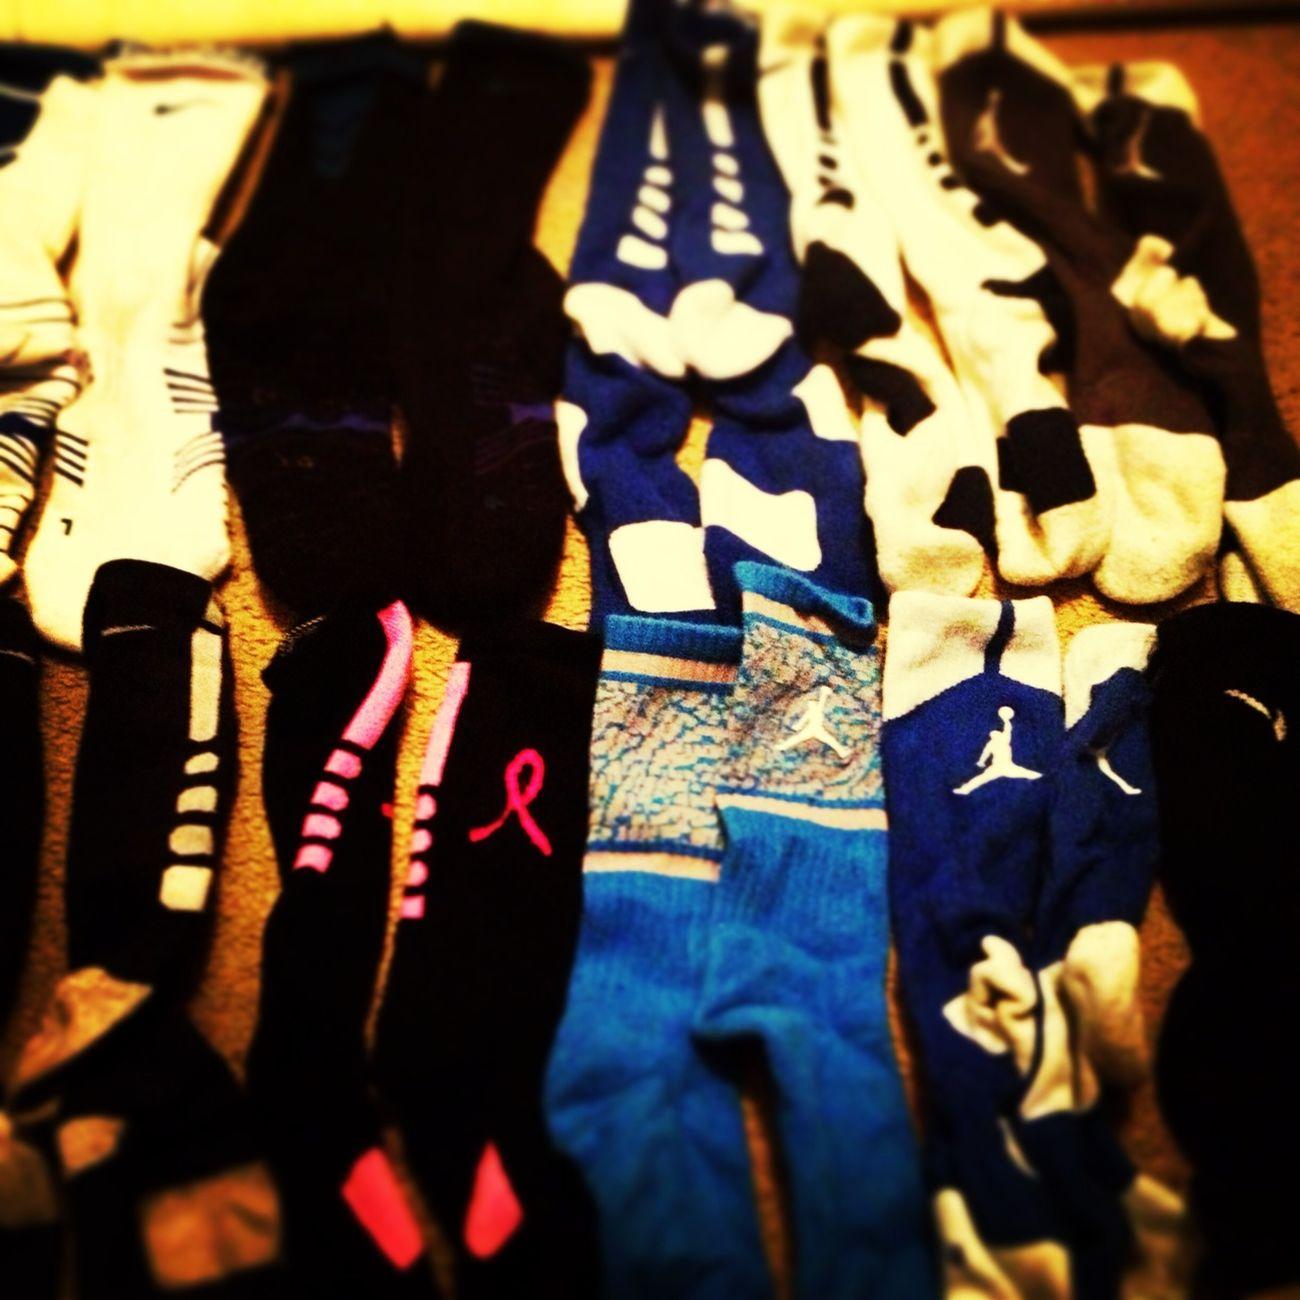 Socks !!